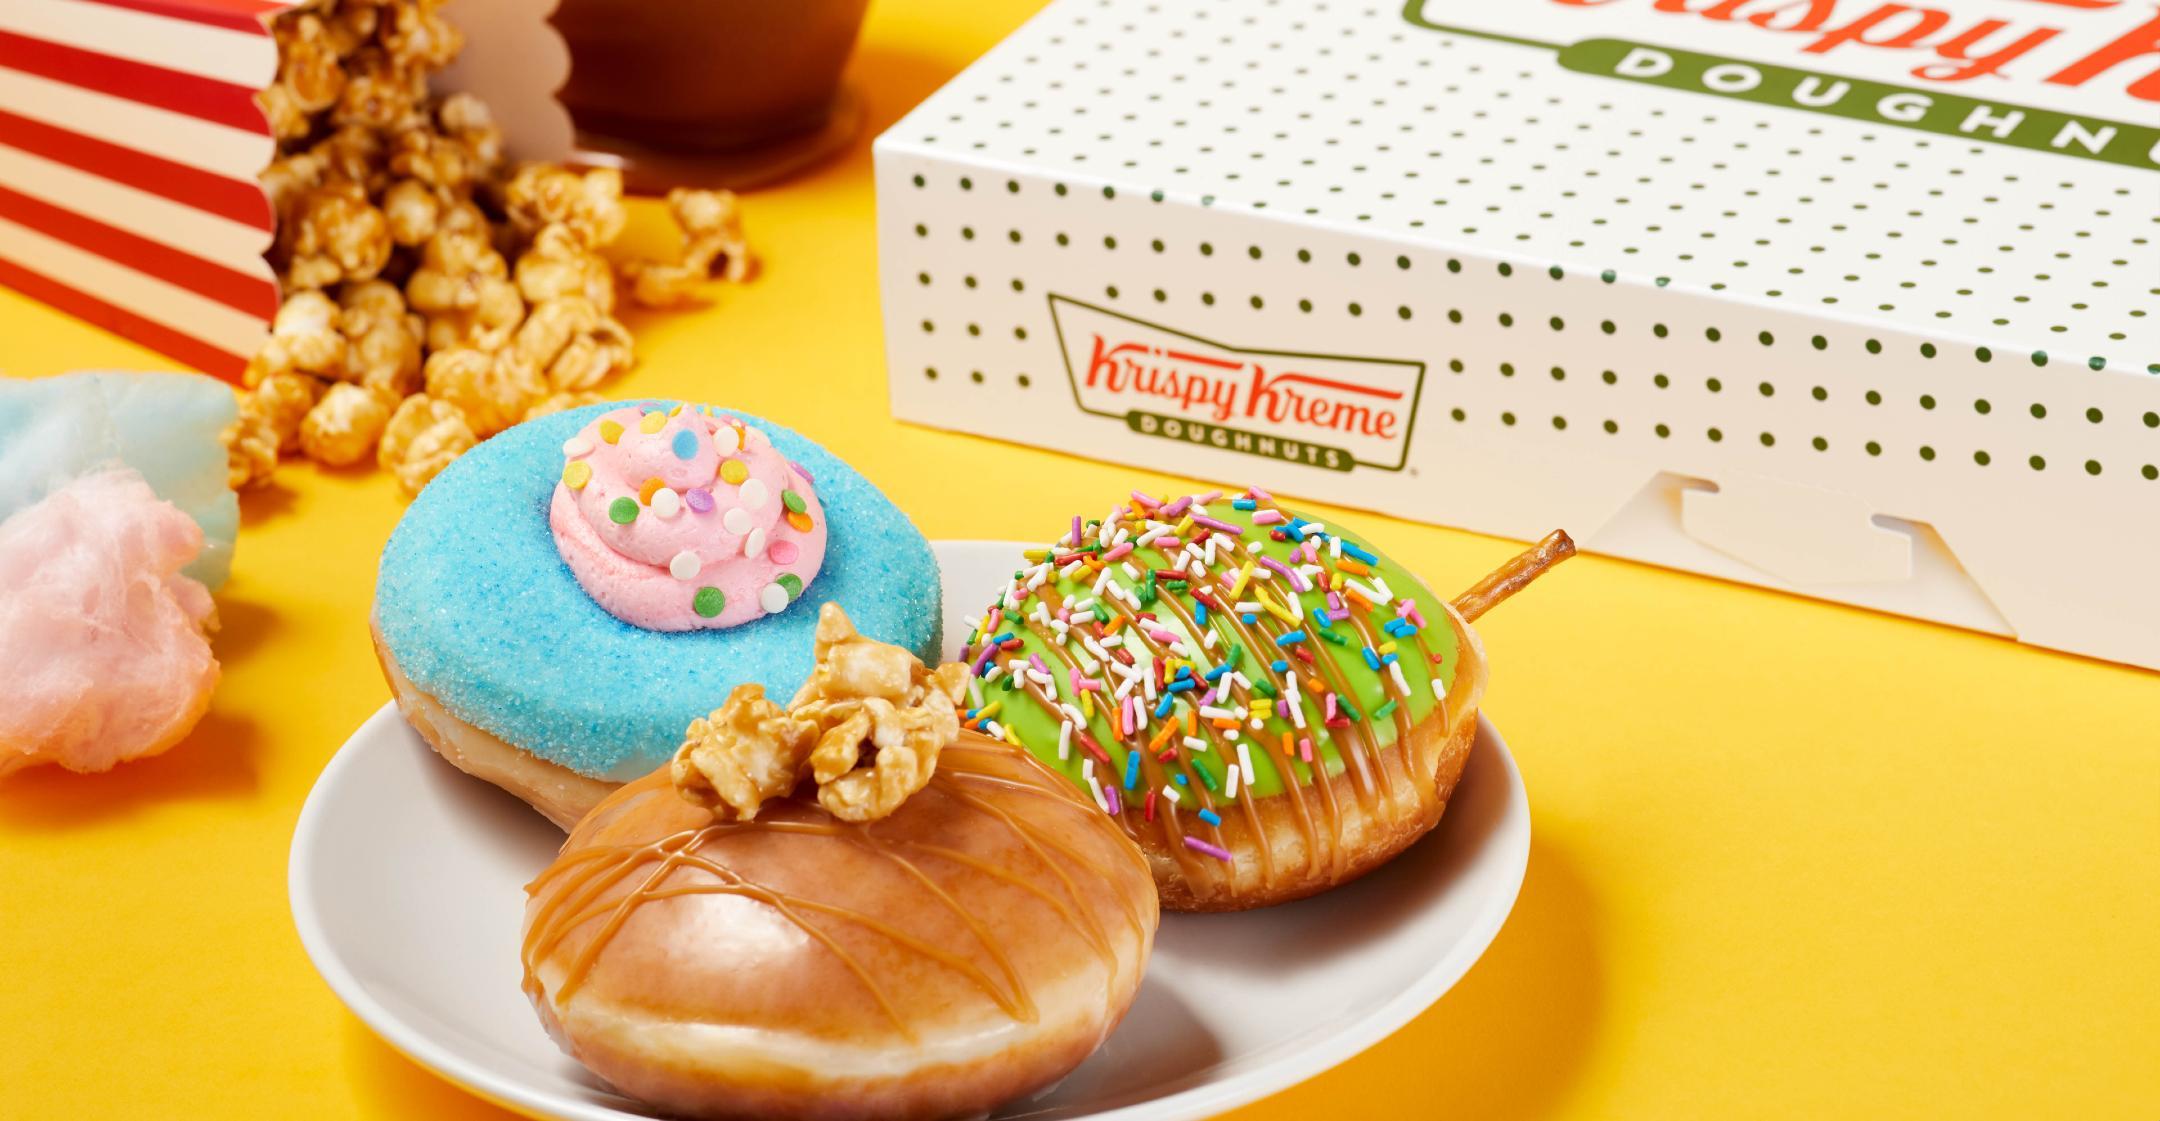 krispy kremes new carnival themed doughnuts